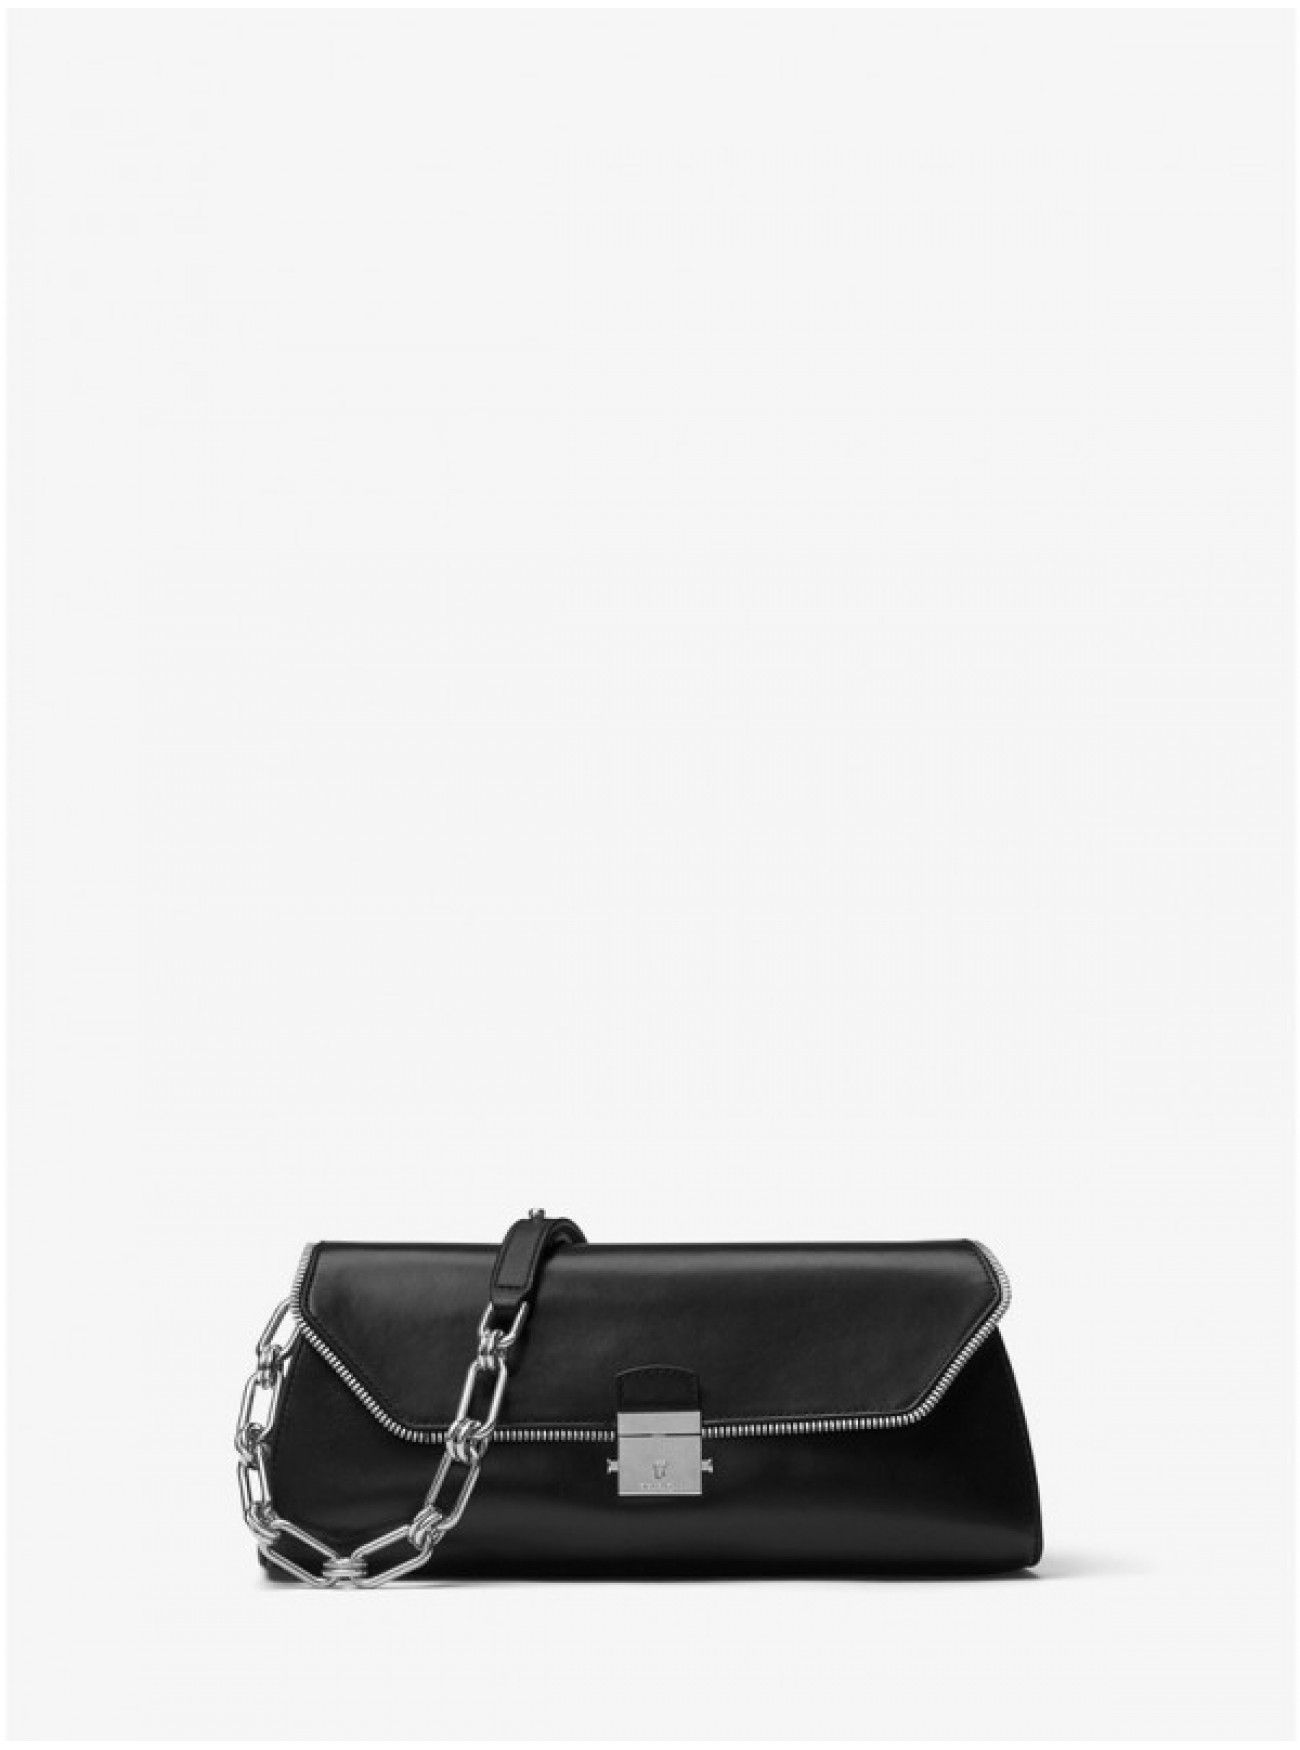 daa08581e6ef Online Michael Kors Collection Mia Zipper Leather Framed Shoulder Bag Black  Cheap